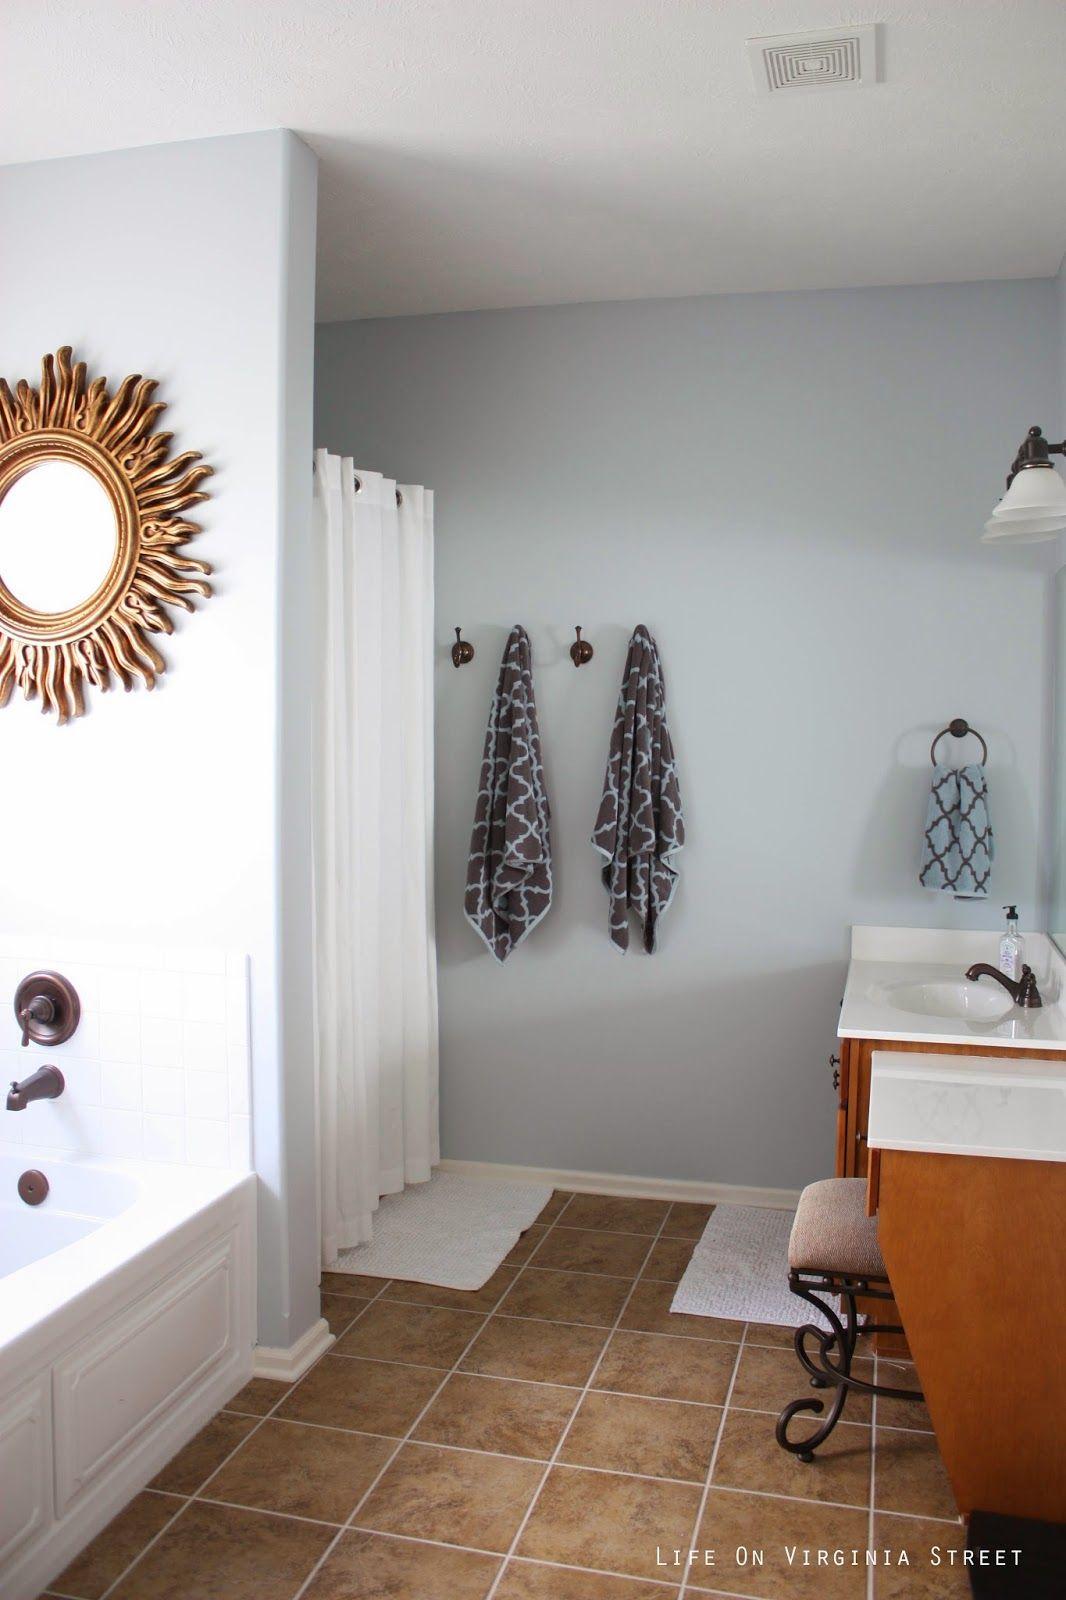 Popular Pins My Pinterest Picks Life On Virginia Street Bathroom Color Schemes Room Paint Colors